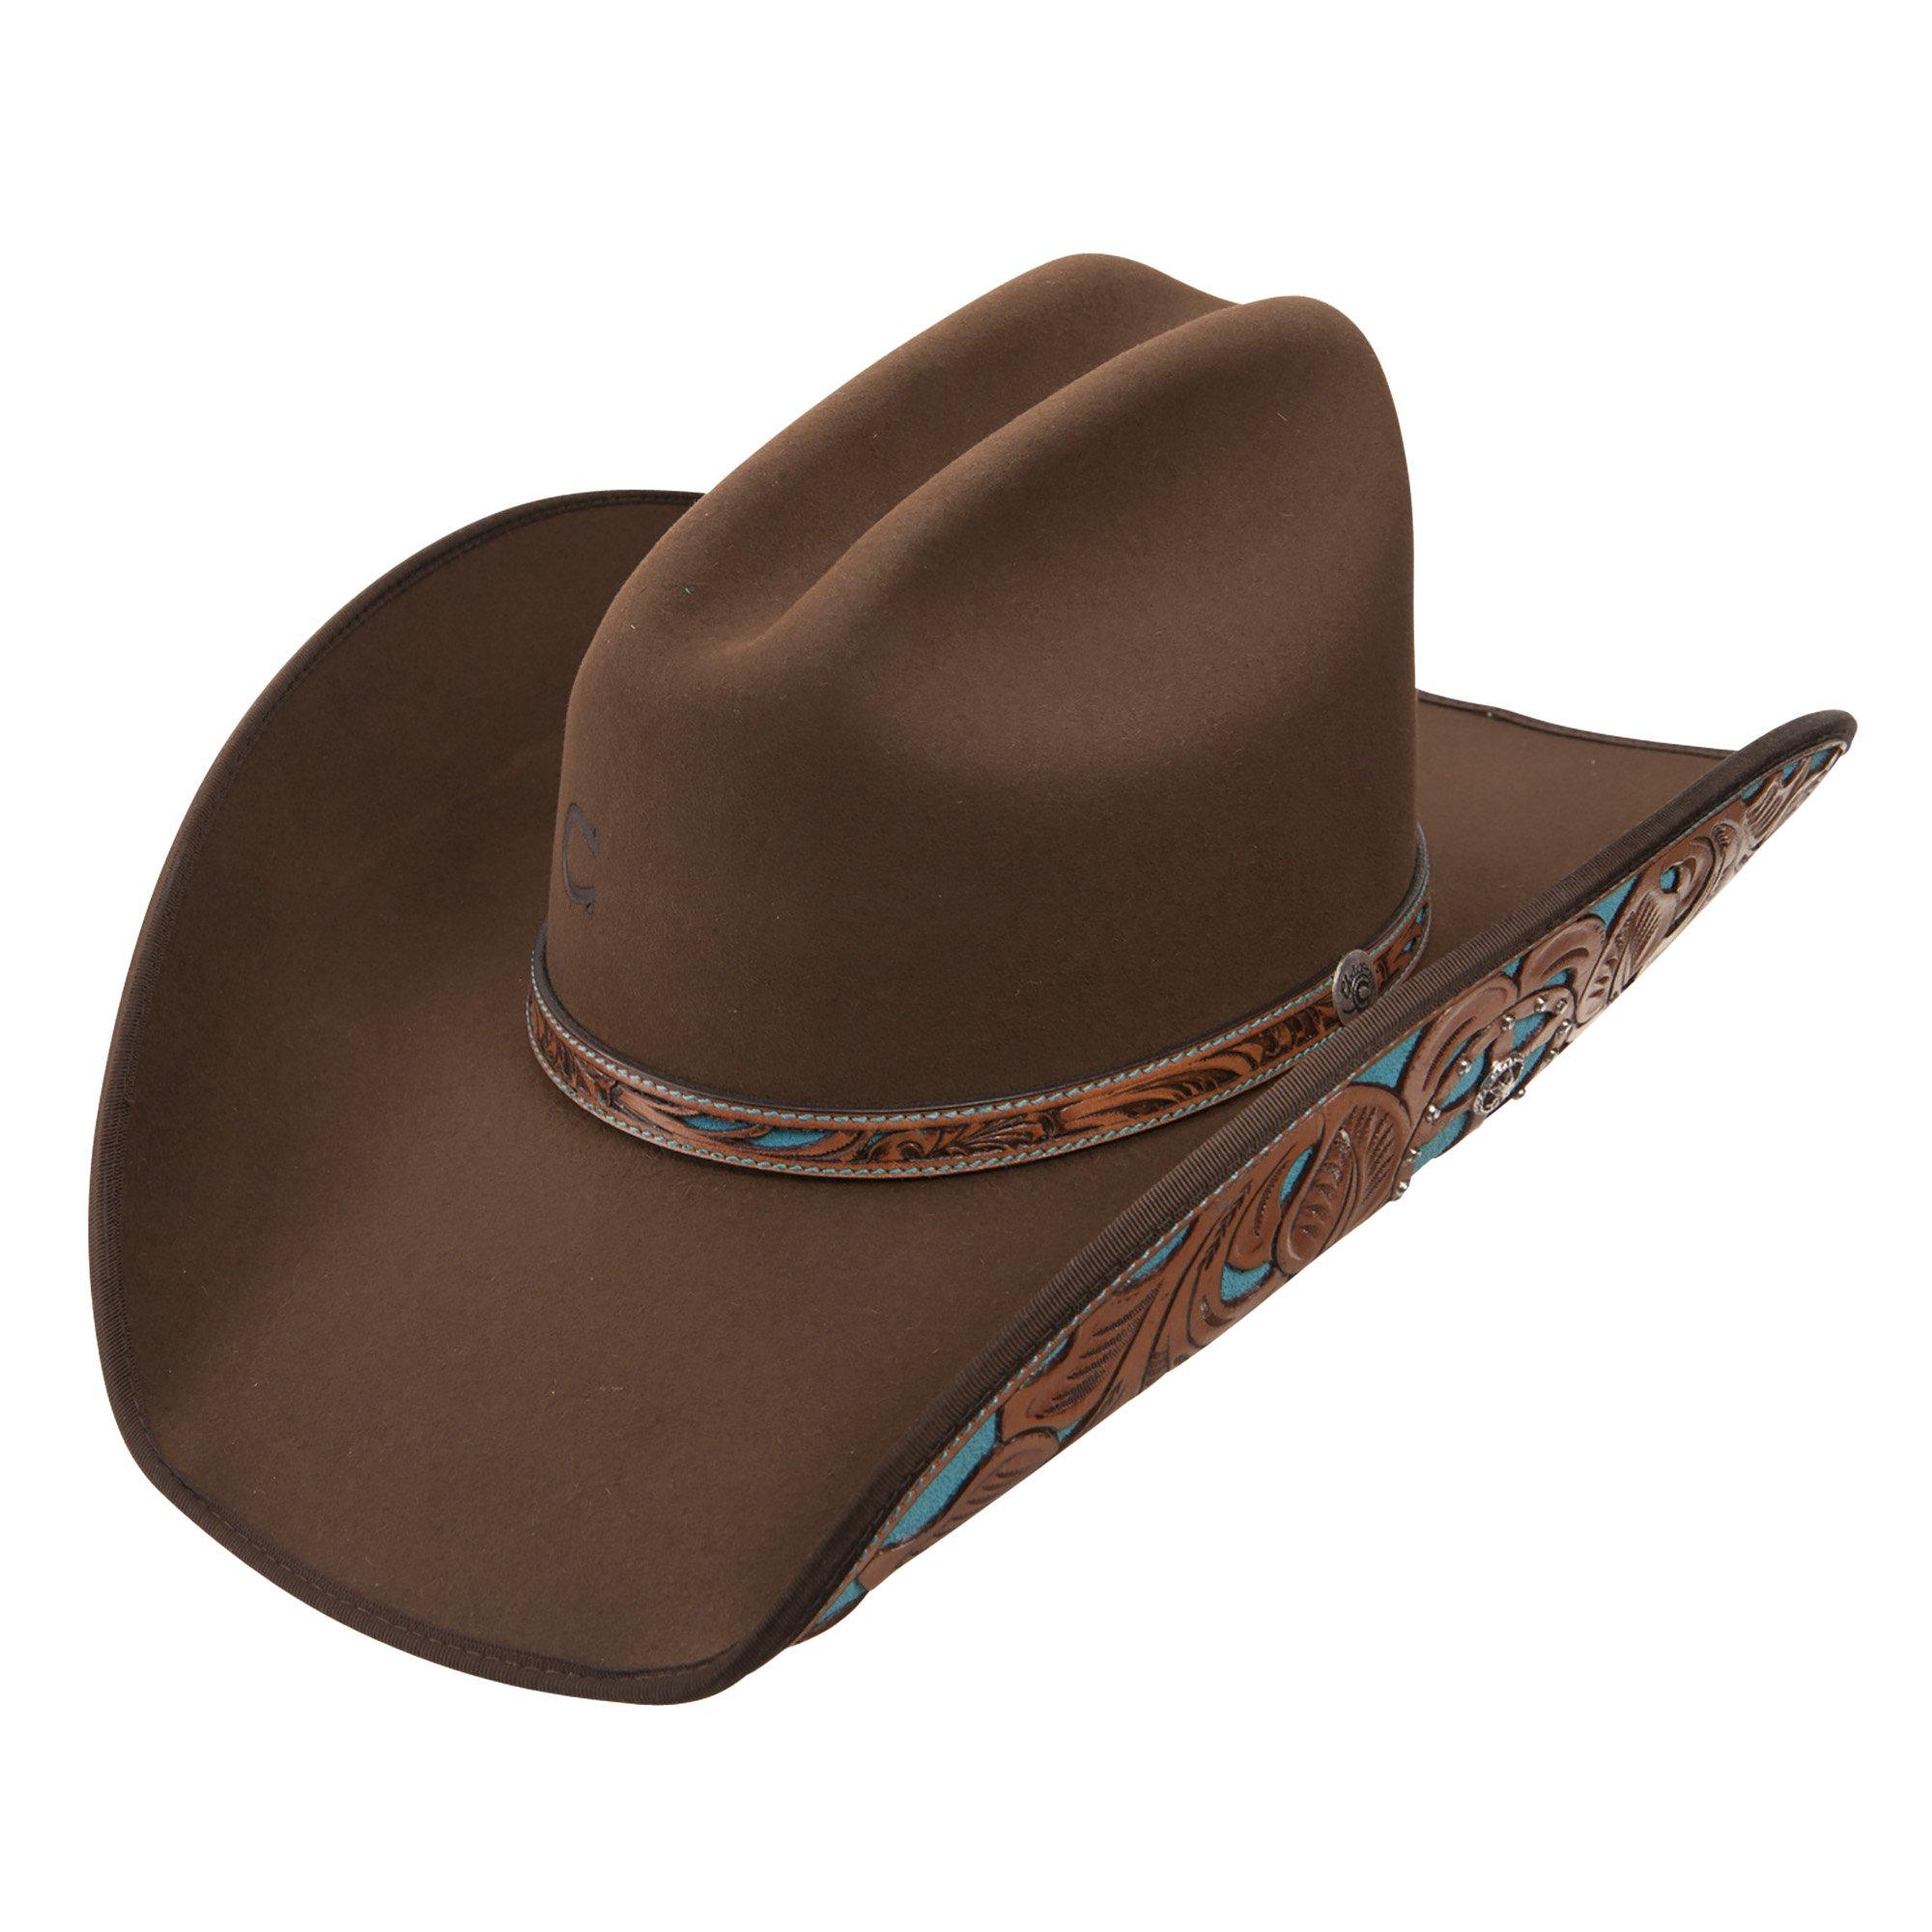 Charlie 1 Horse Cheyenne Cowboy Hat (6 3/4)